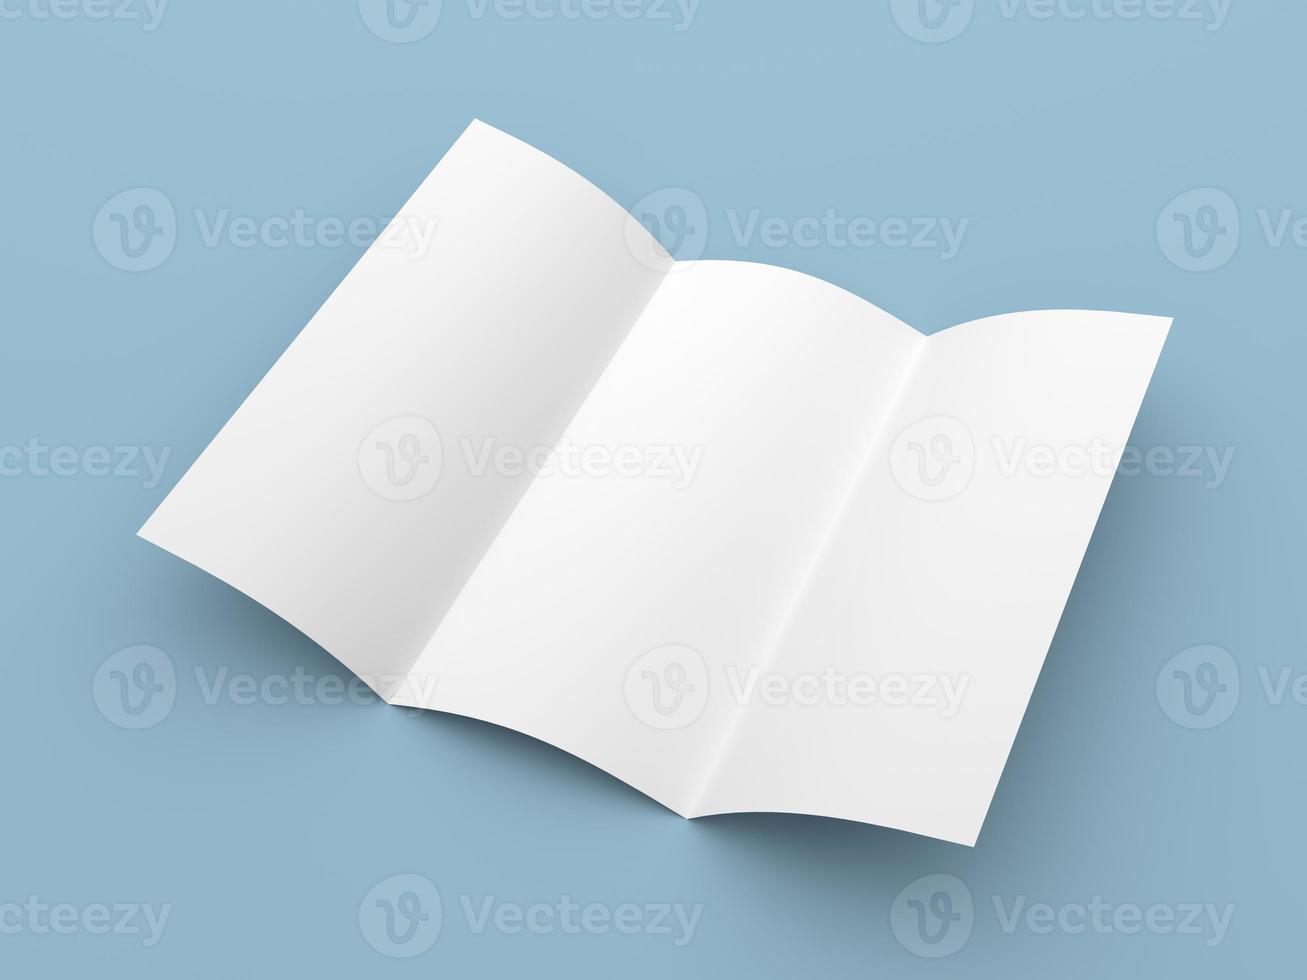 folheto em branco com três dobras papel branco brochura foto